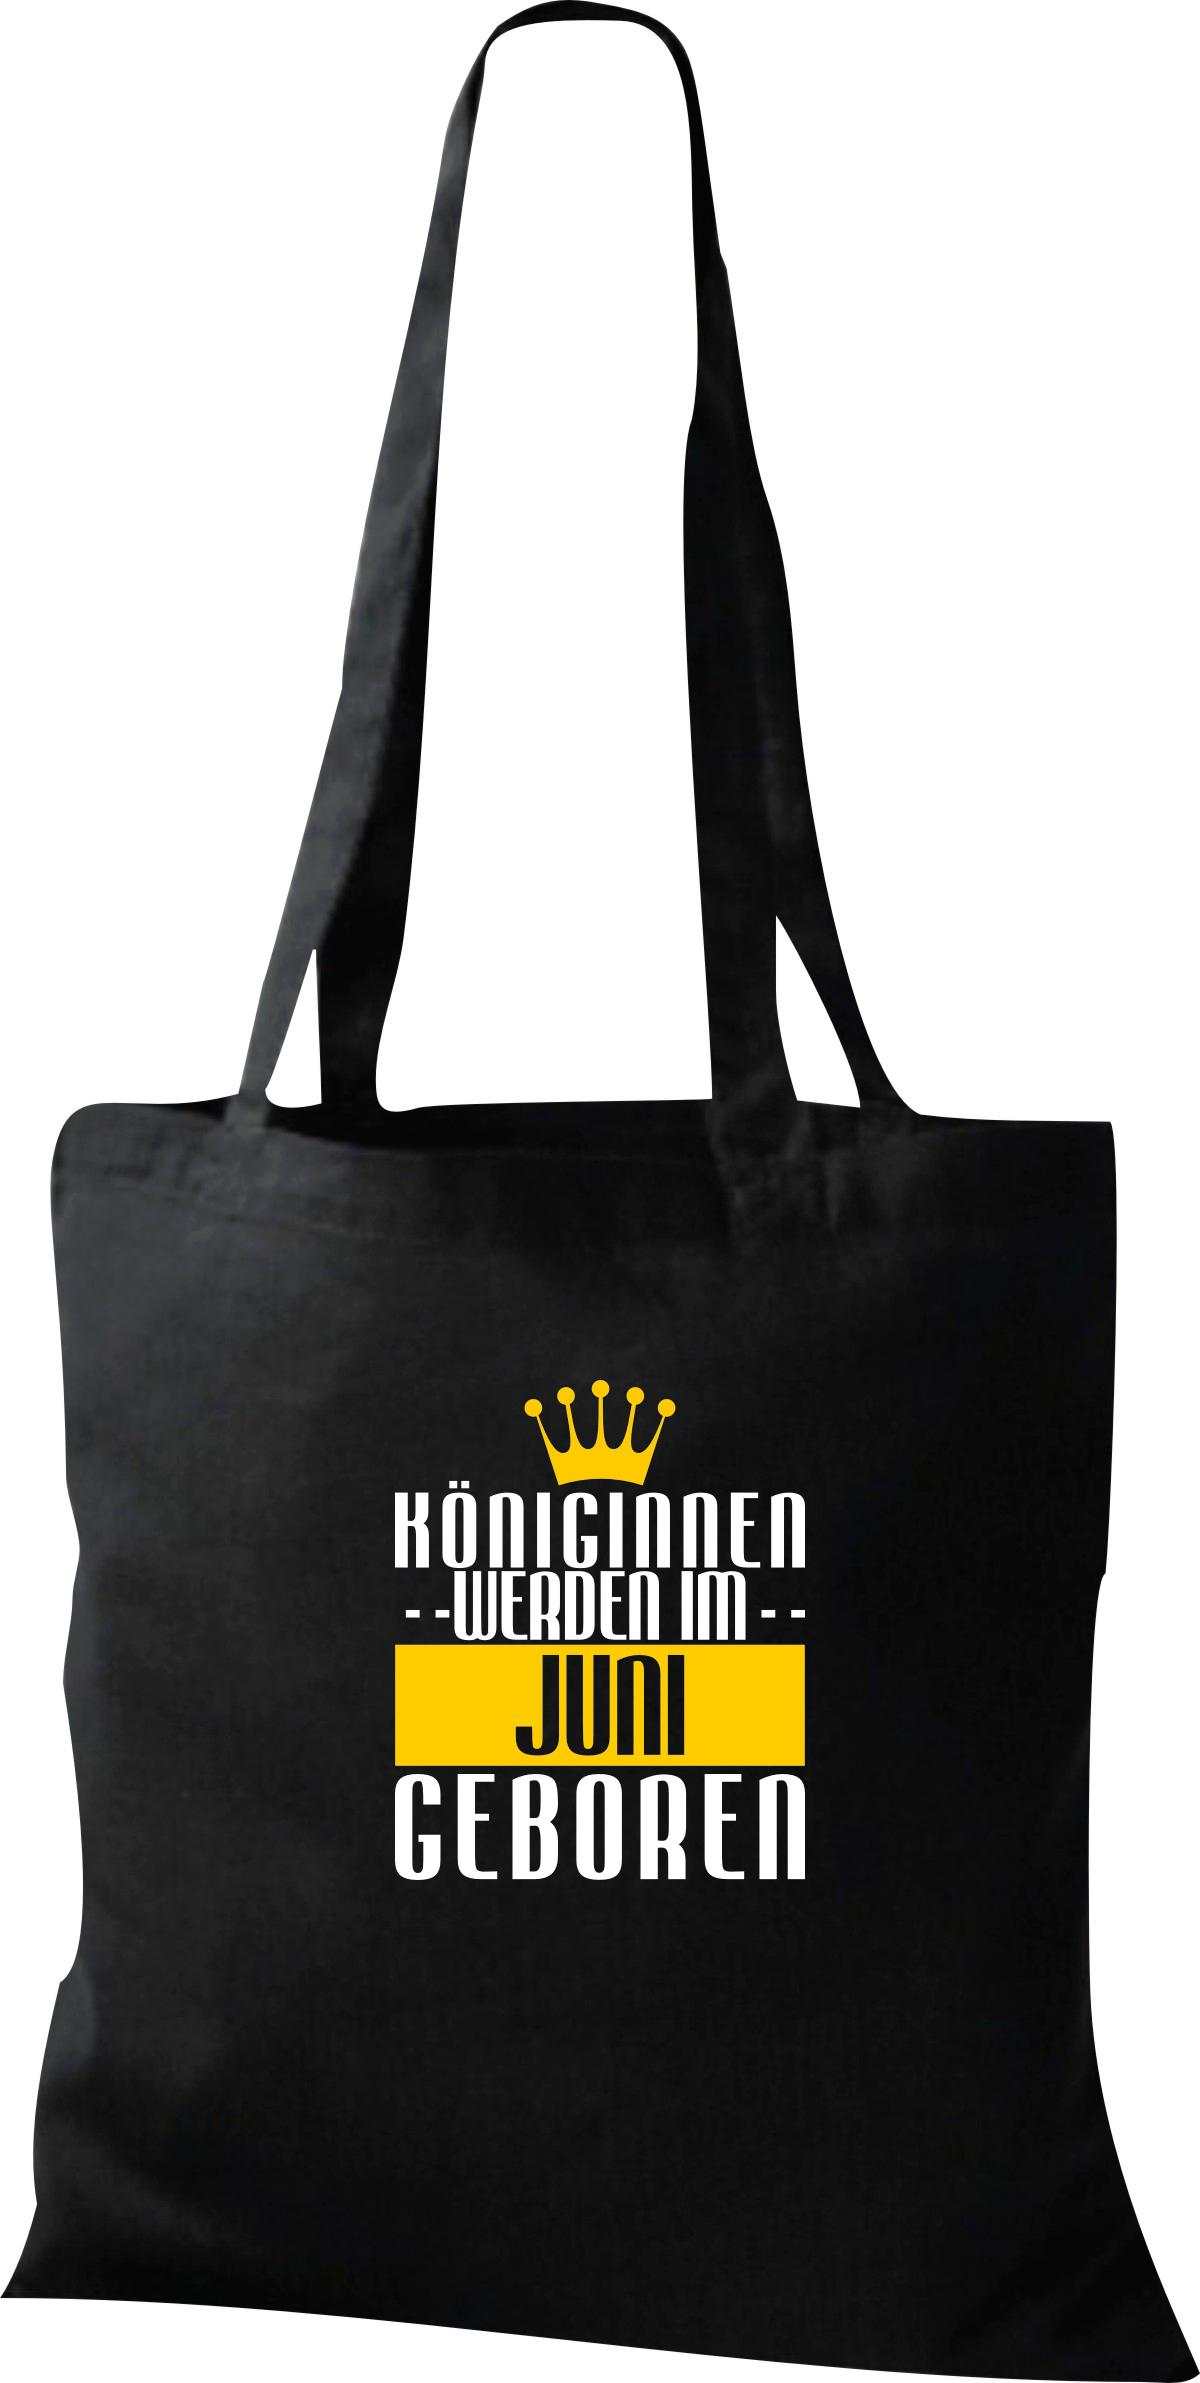 Shopping-Bag-Organic-Zen-Shopper-Koeniginnen-werden-im-JUNI-geboren